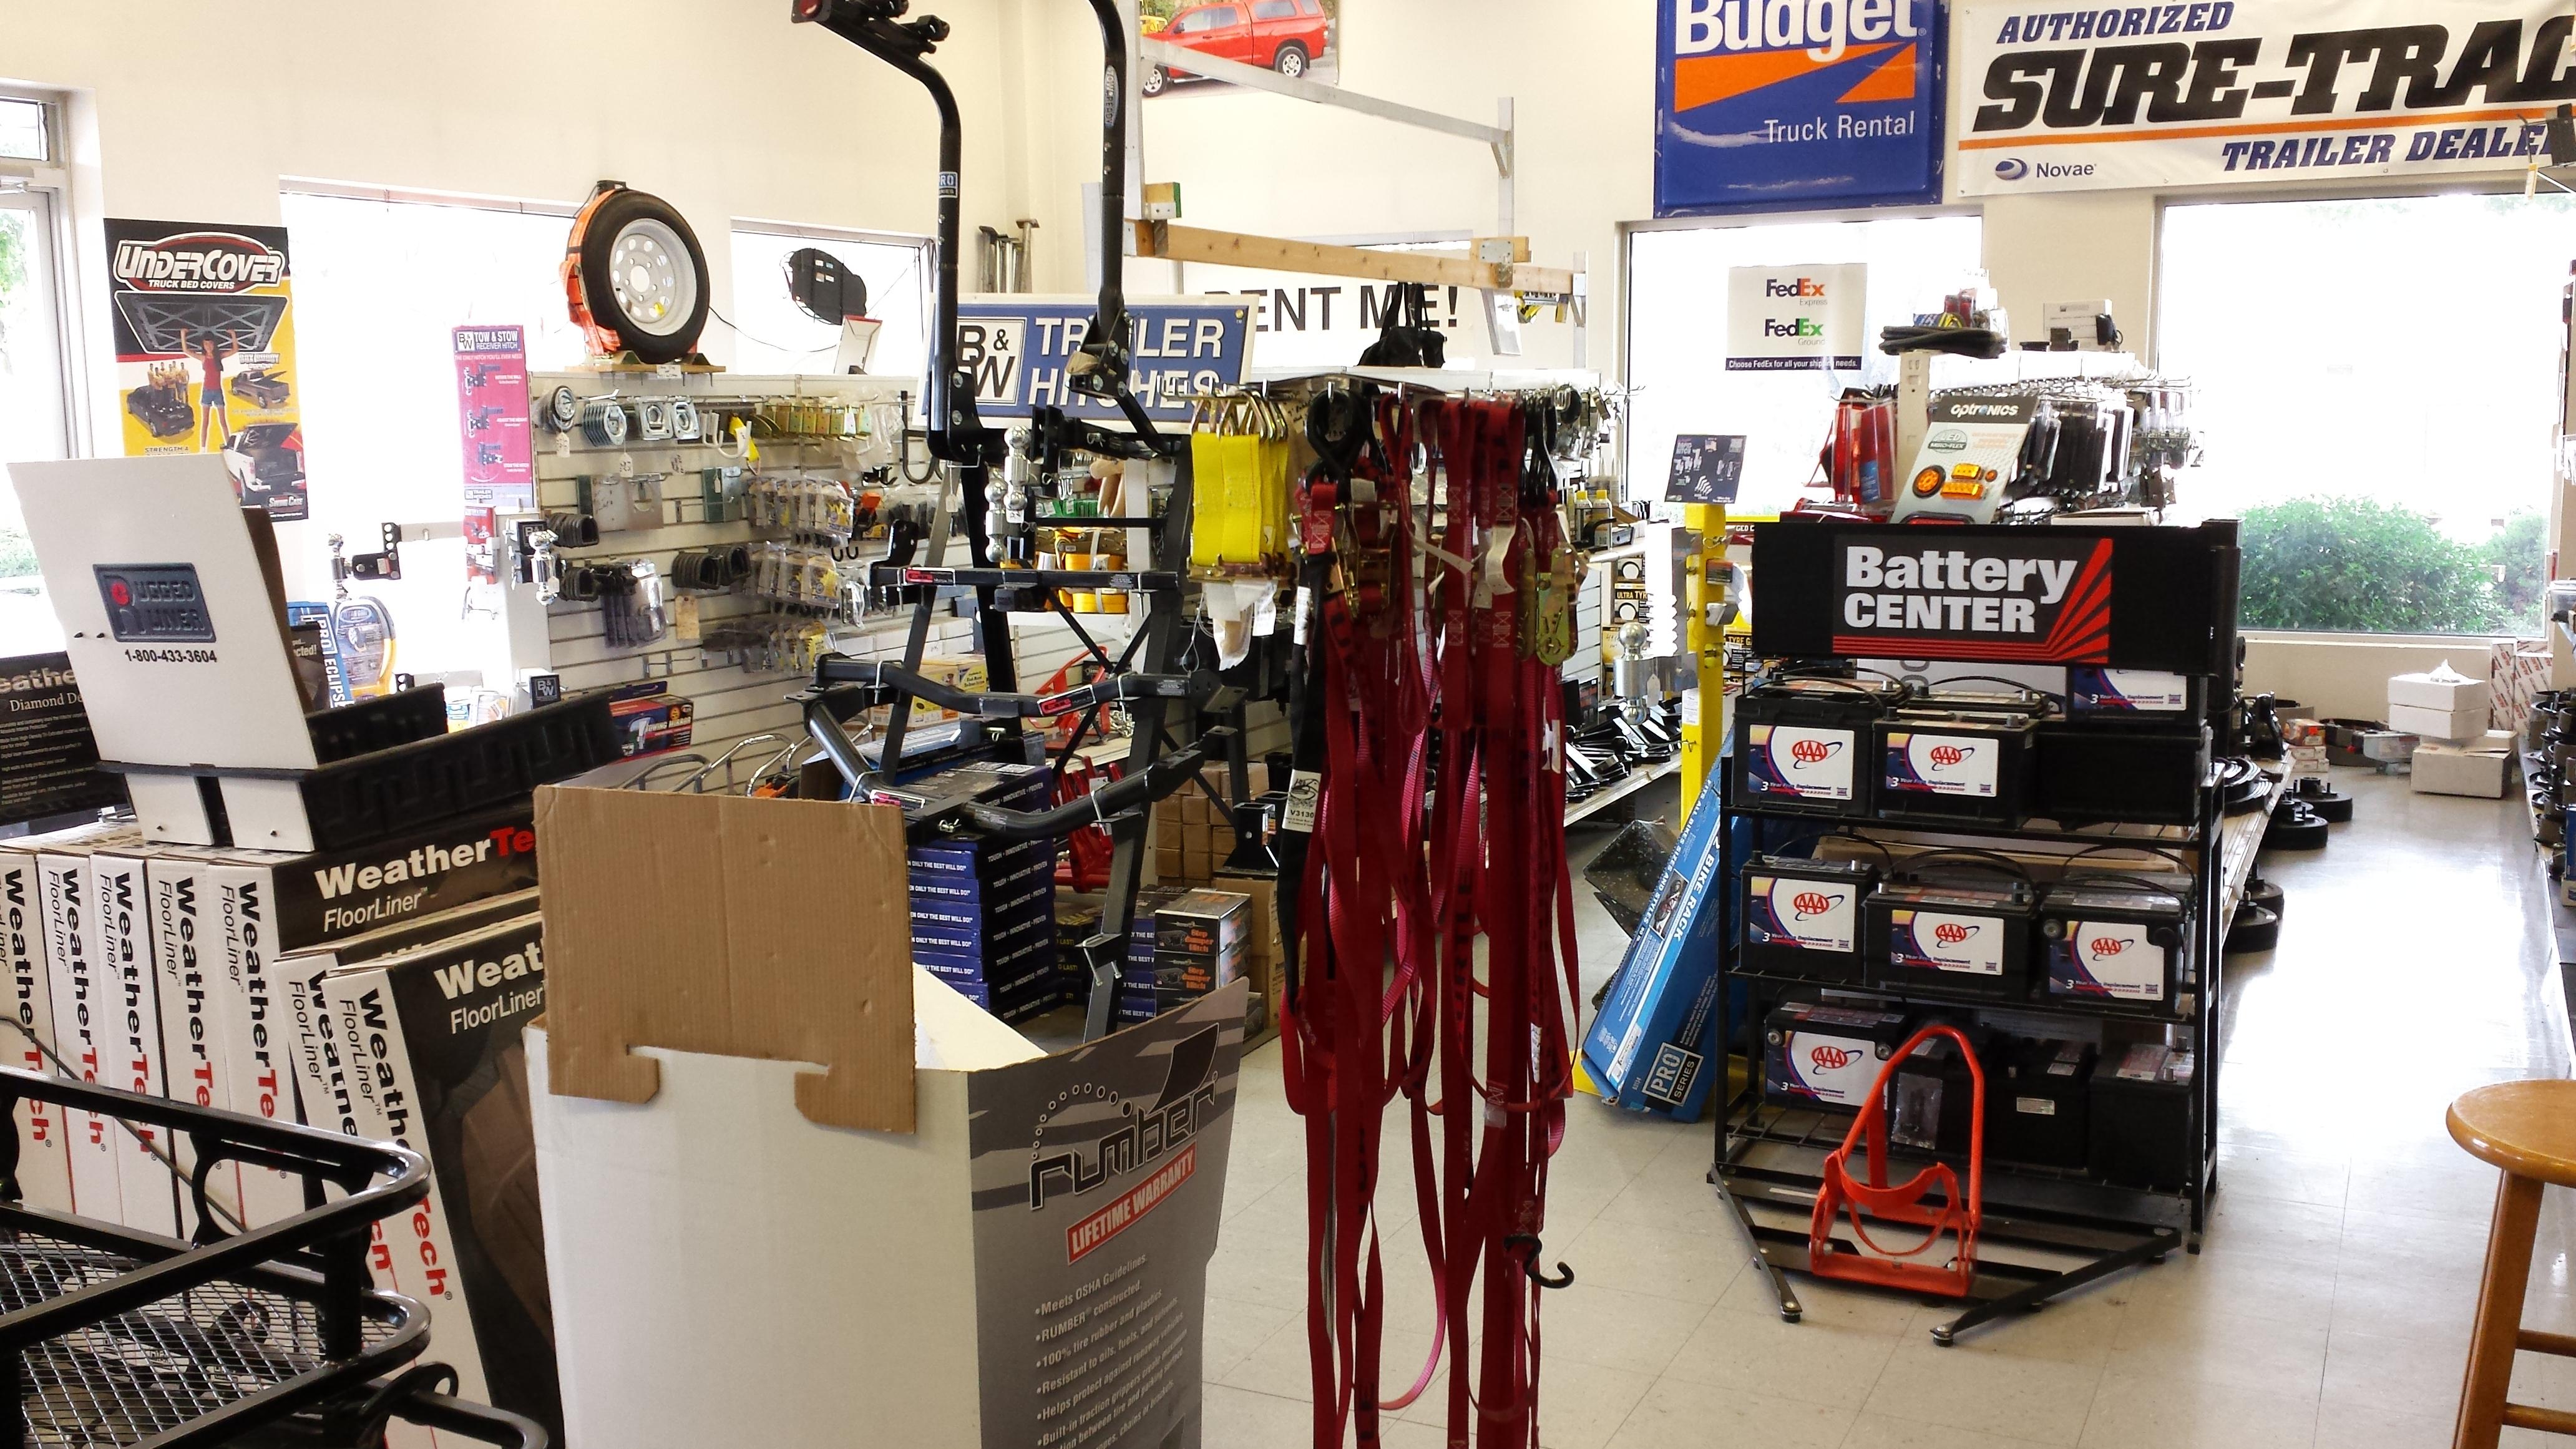 Huge showroom, parts, LED lights, brakes, accessories